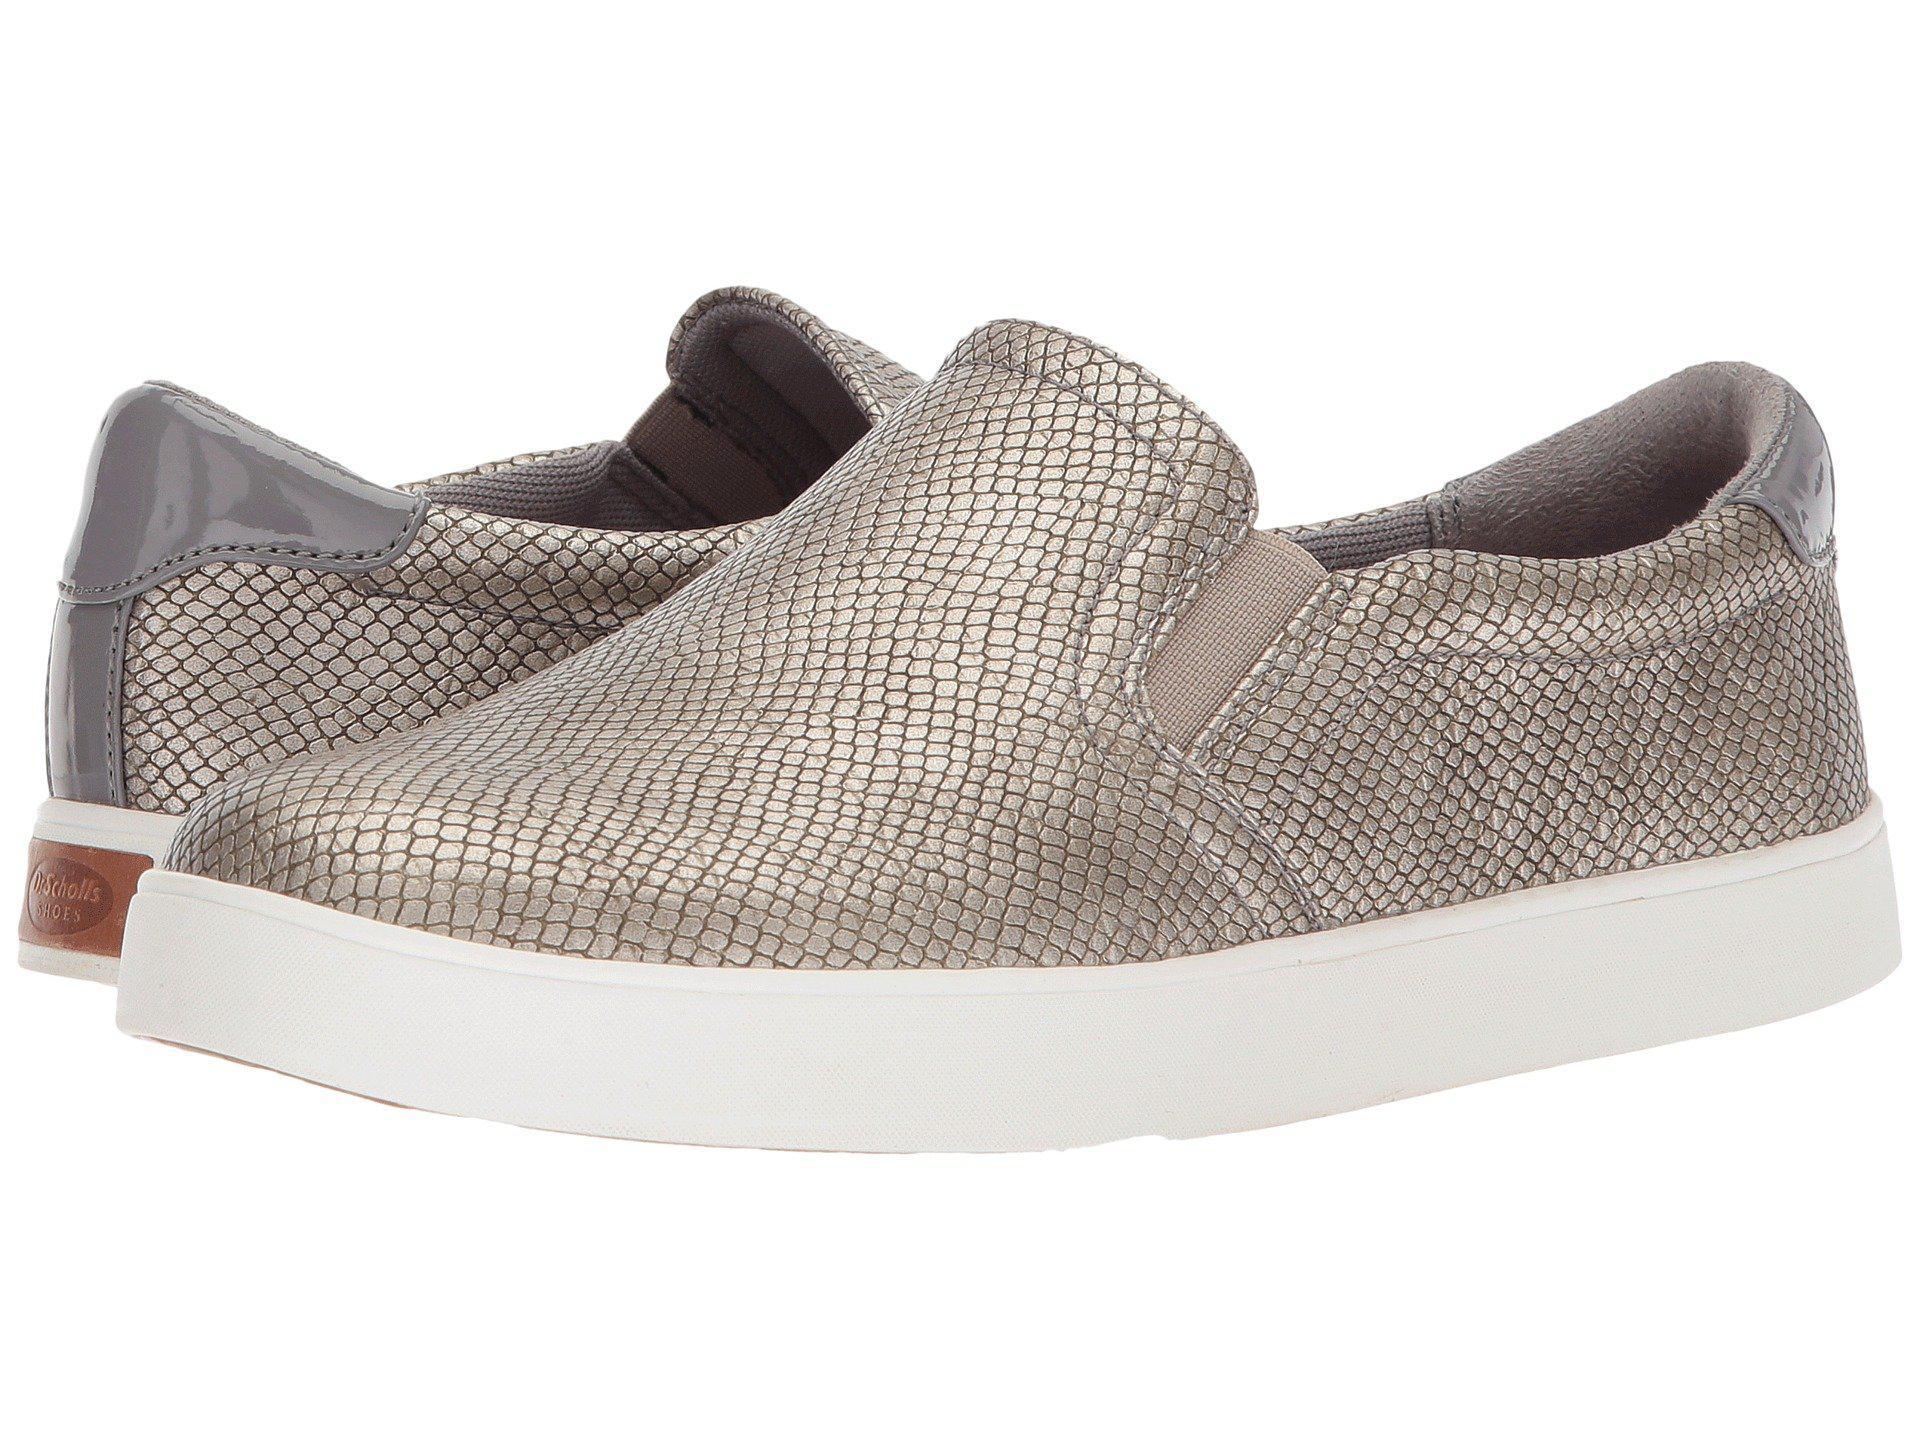 50df79d13b59 Lyst - Dr. Scholls Madison (black black Lizard Print) Women s Shoes ...